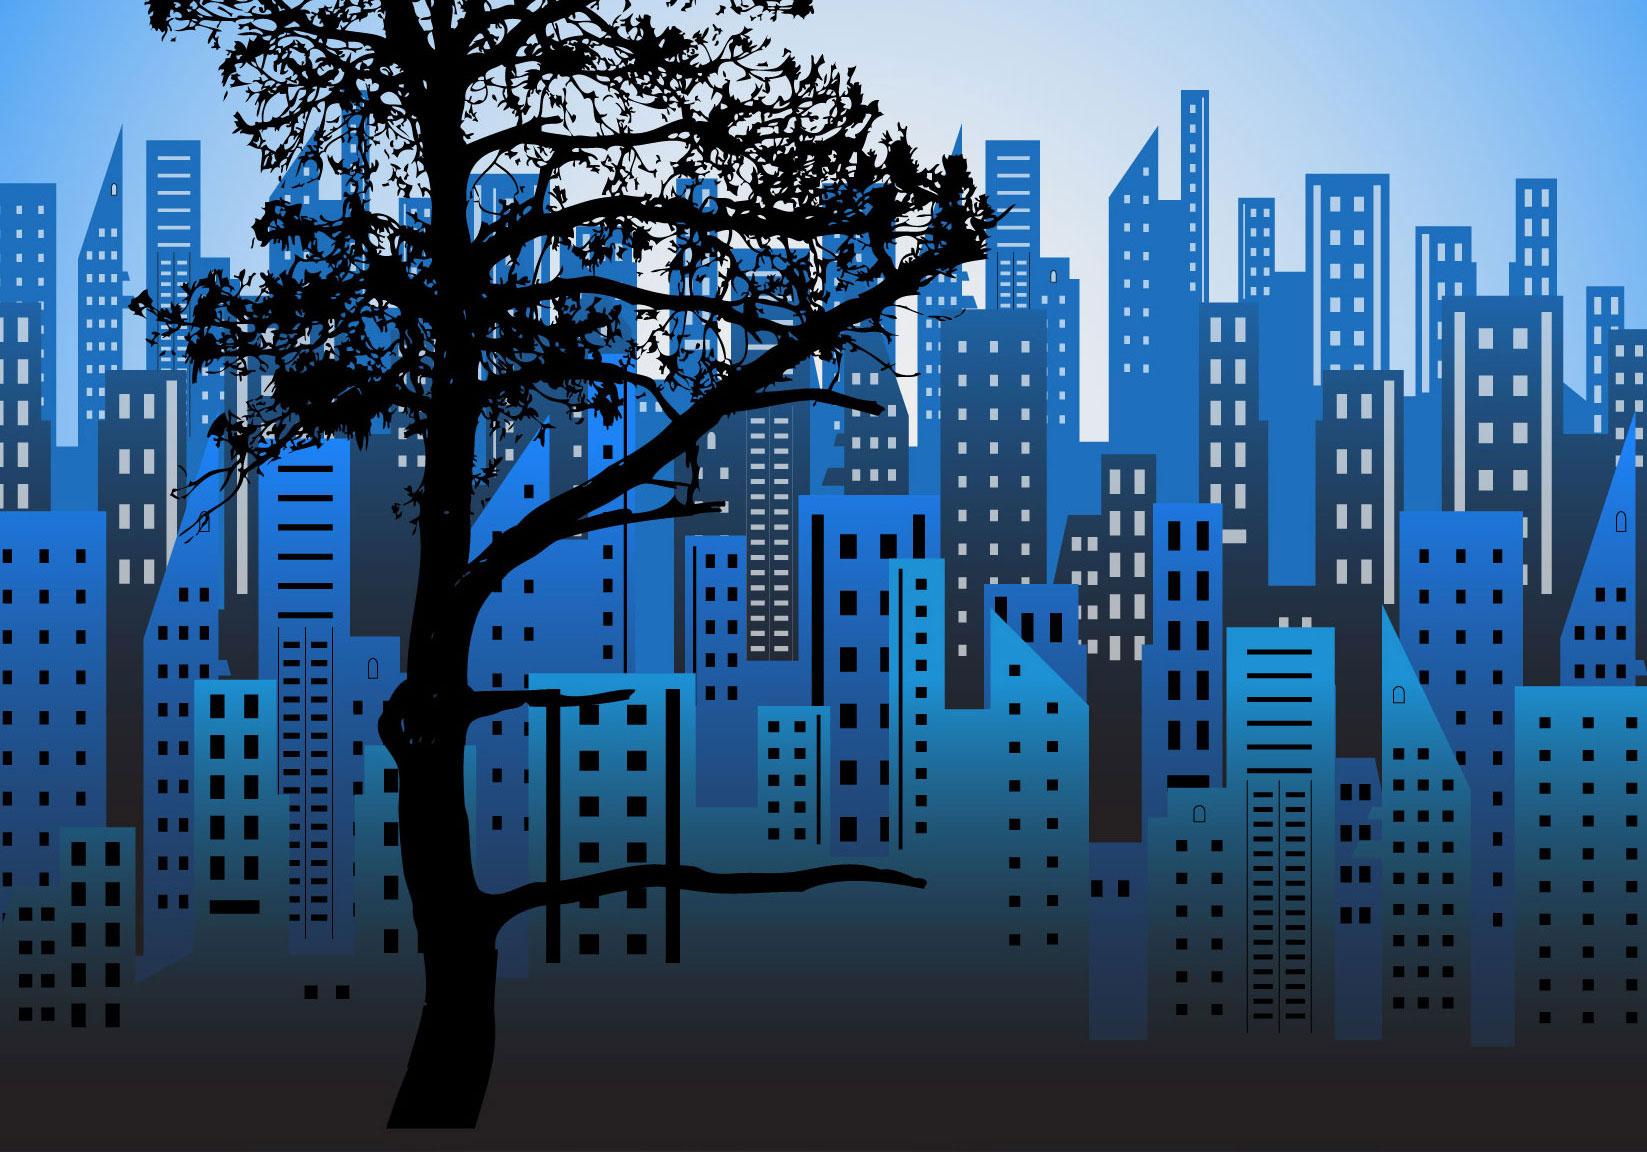 Background Property Developments : Cranewoods development llc real estate